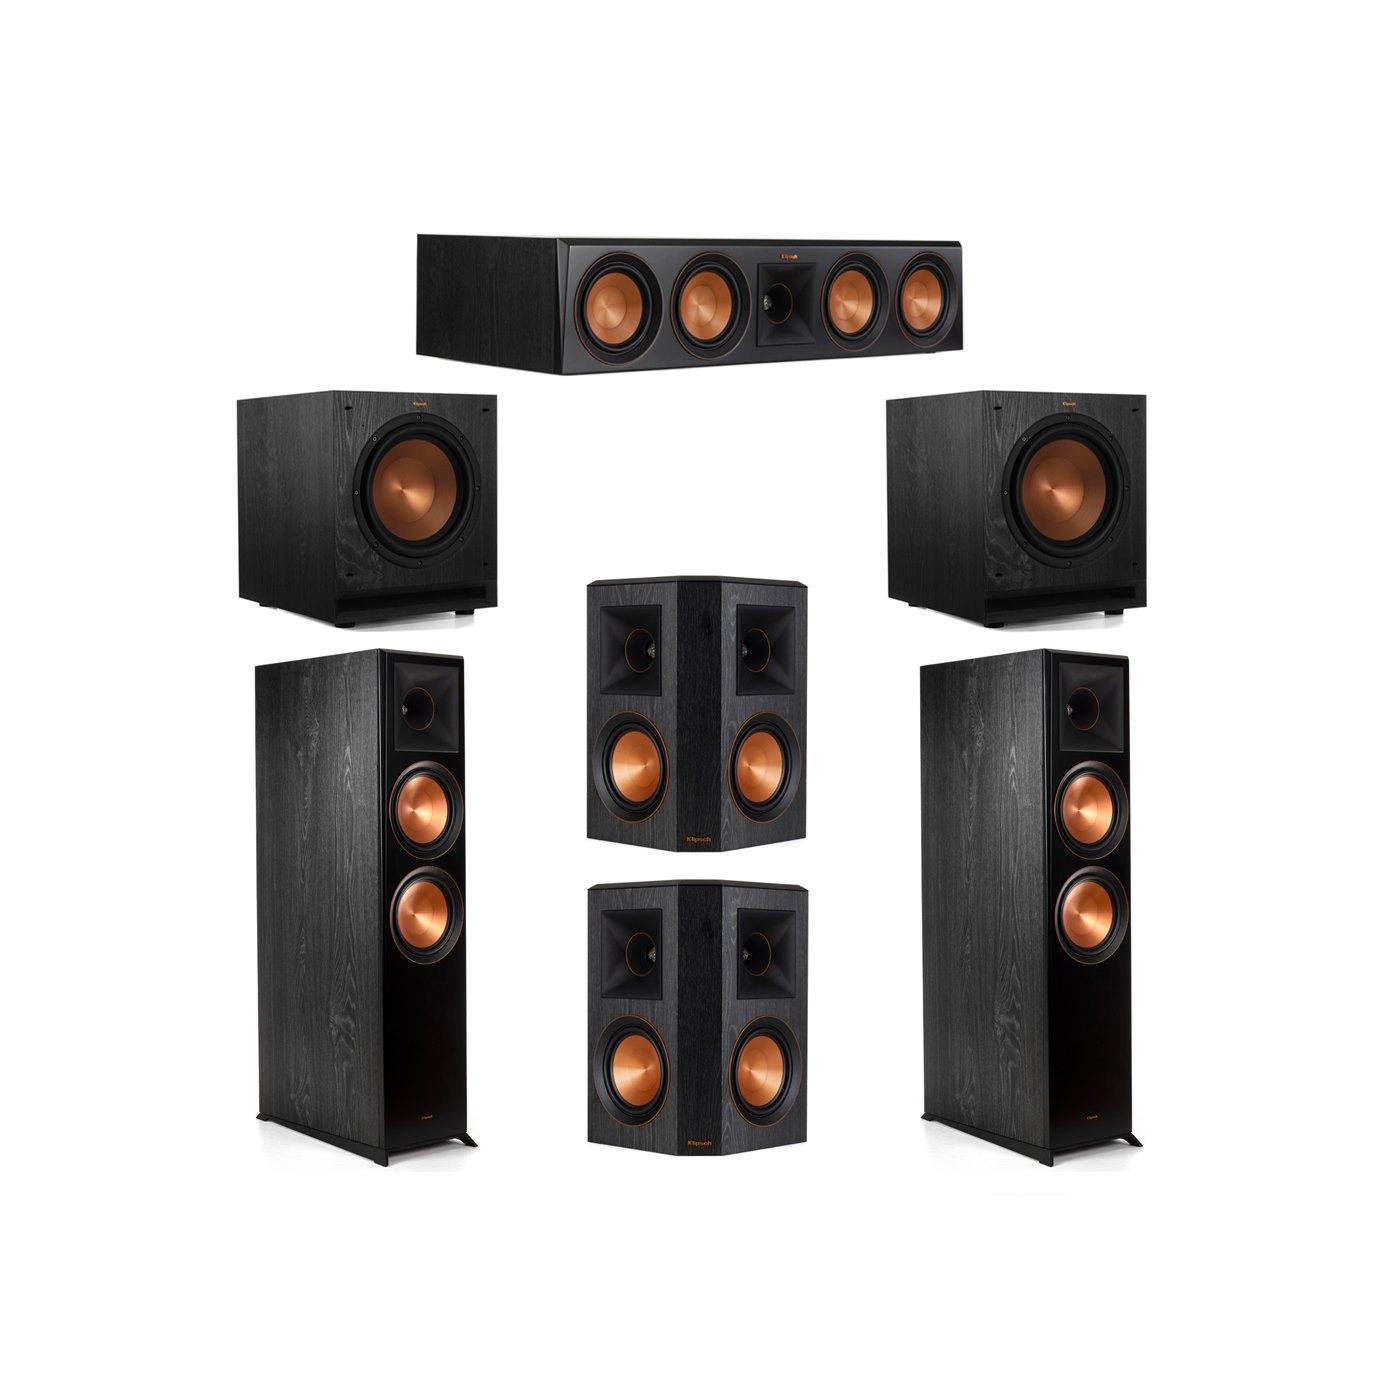 Klipsch 5.2 System with 2 RP-8000F Floorstanding Speakers, 1 Klipsch RP-504C Center Speaker, 2 Klipsch RP-502S Surround Speakers, 2 Klipsch SPL-100 Subwoofers